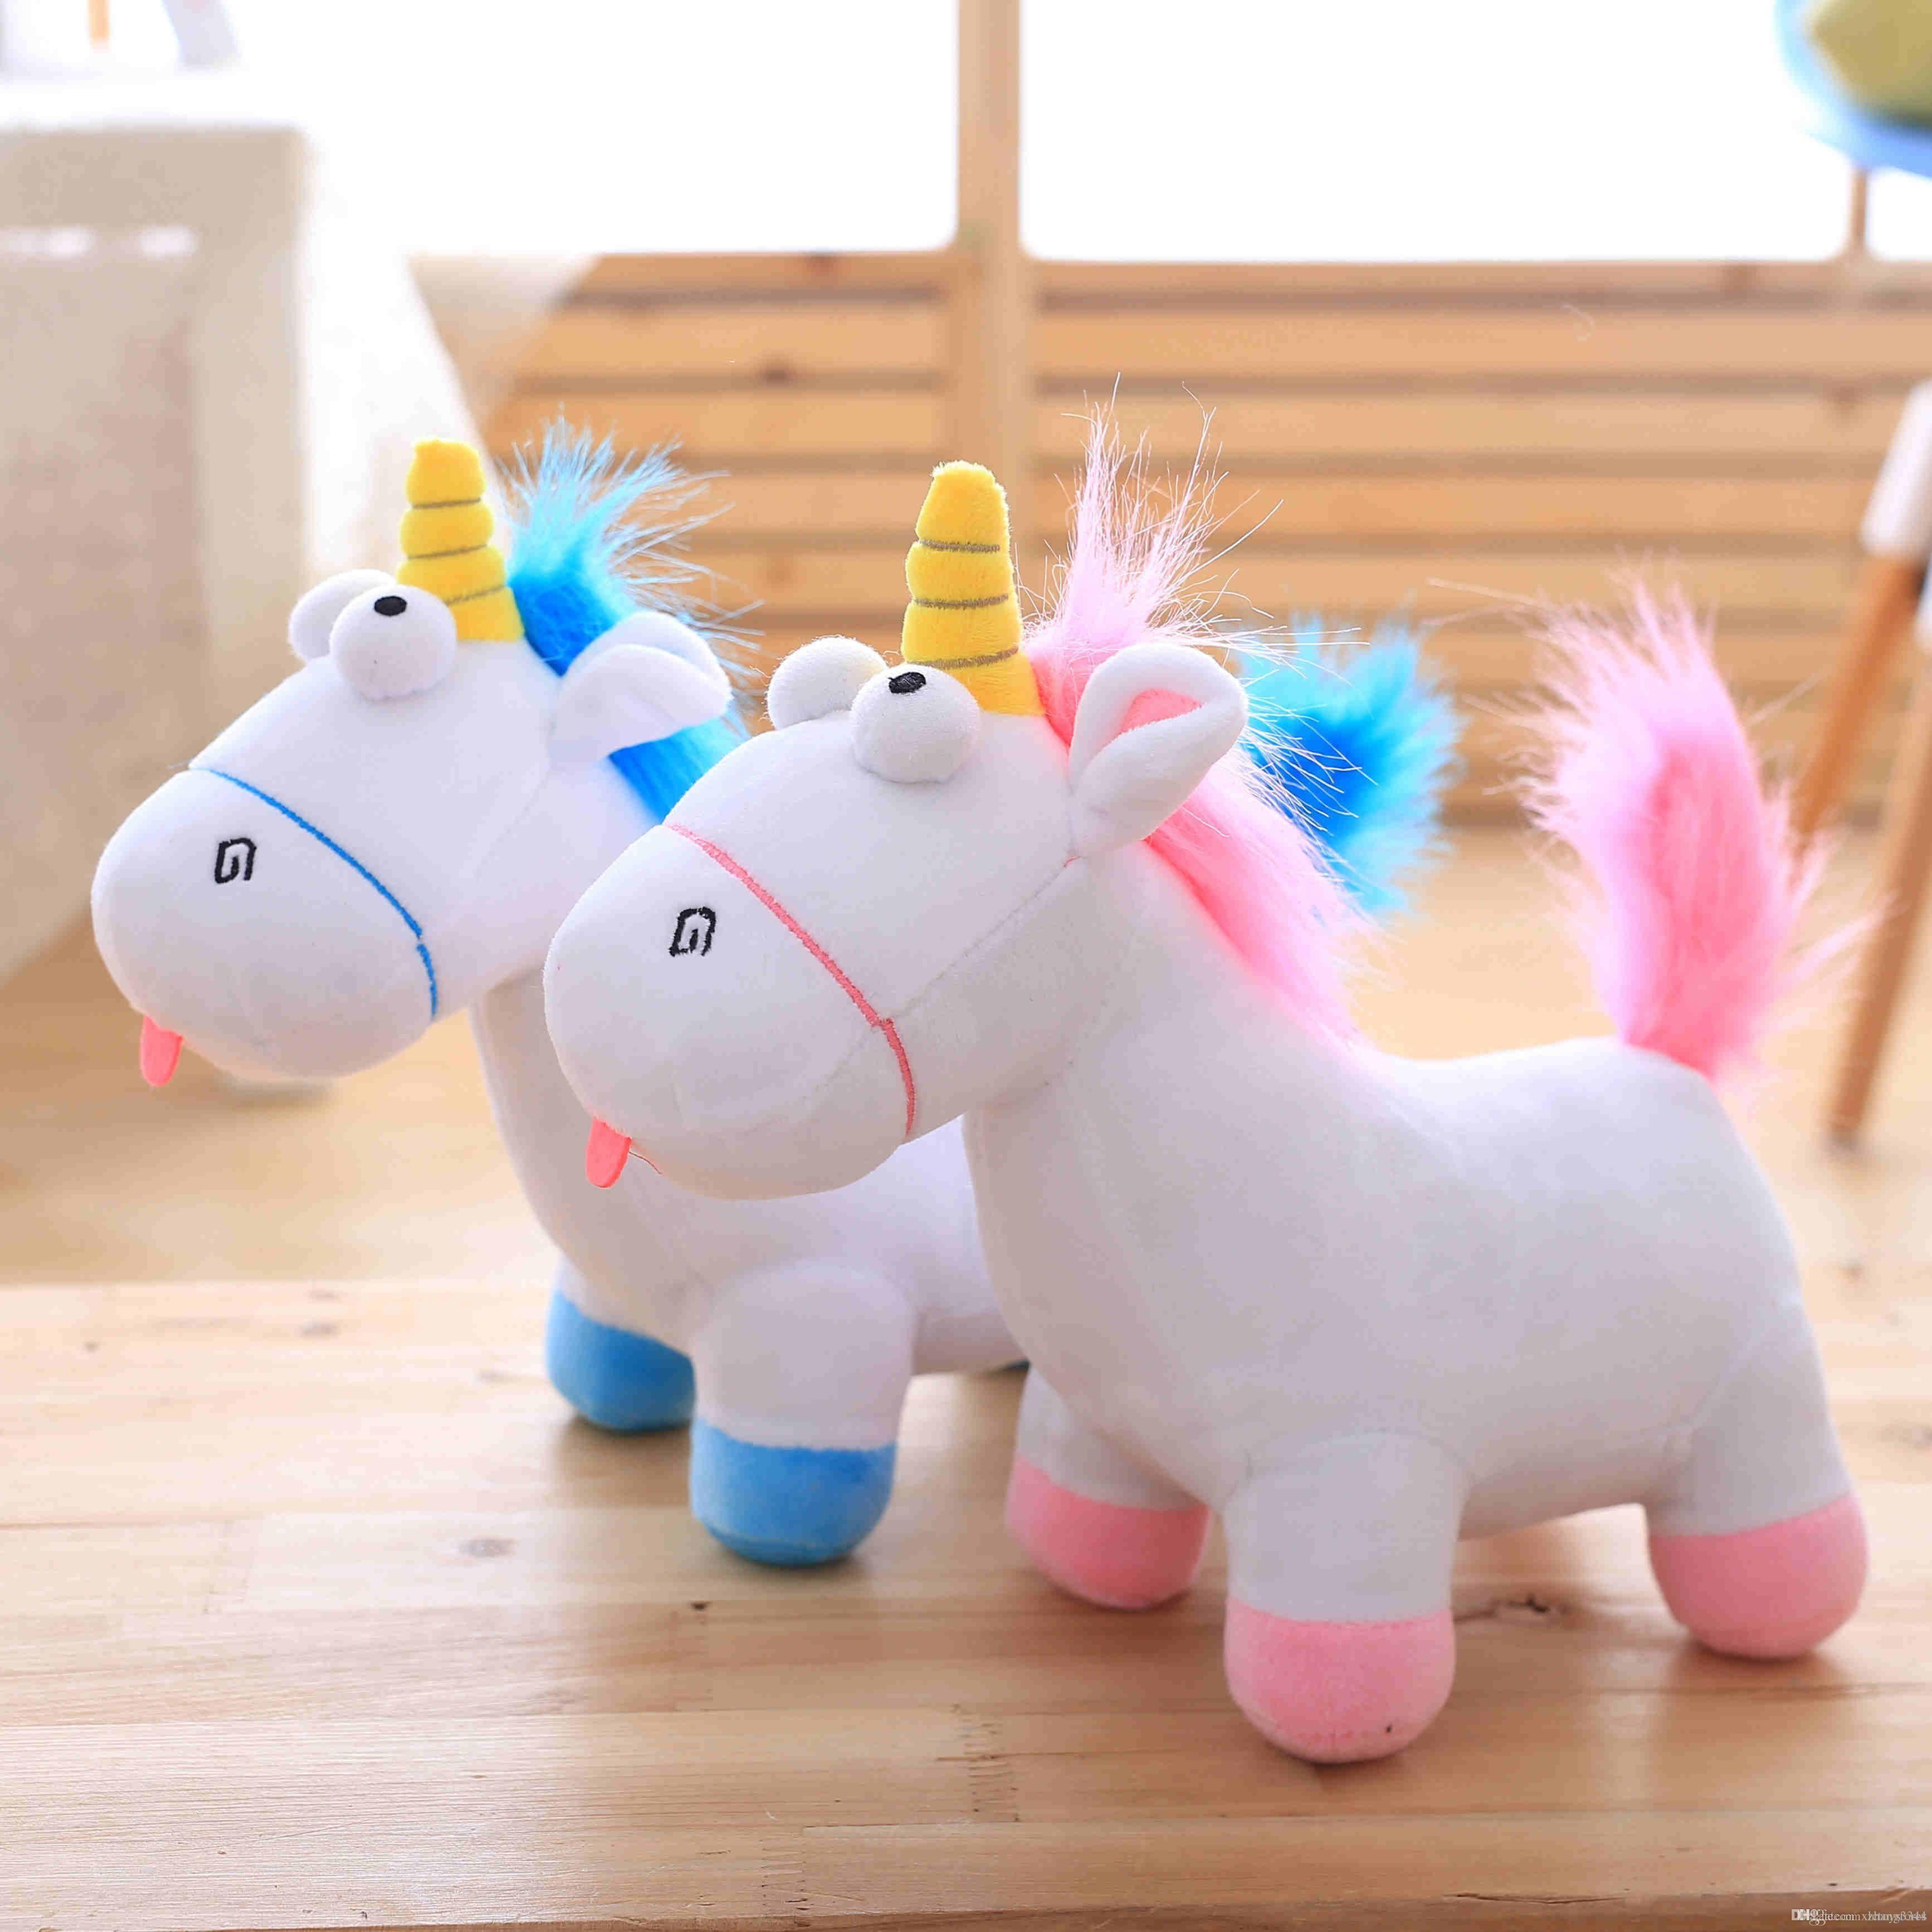 Toys & Hobbies High Quality 75cm Kawaii Unicorn Plush Toy Unicorn Doll Cute Animals Horse Stuffed Soft Pillow Baby Kids Toys Children Gifts